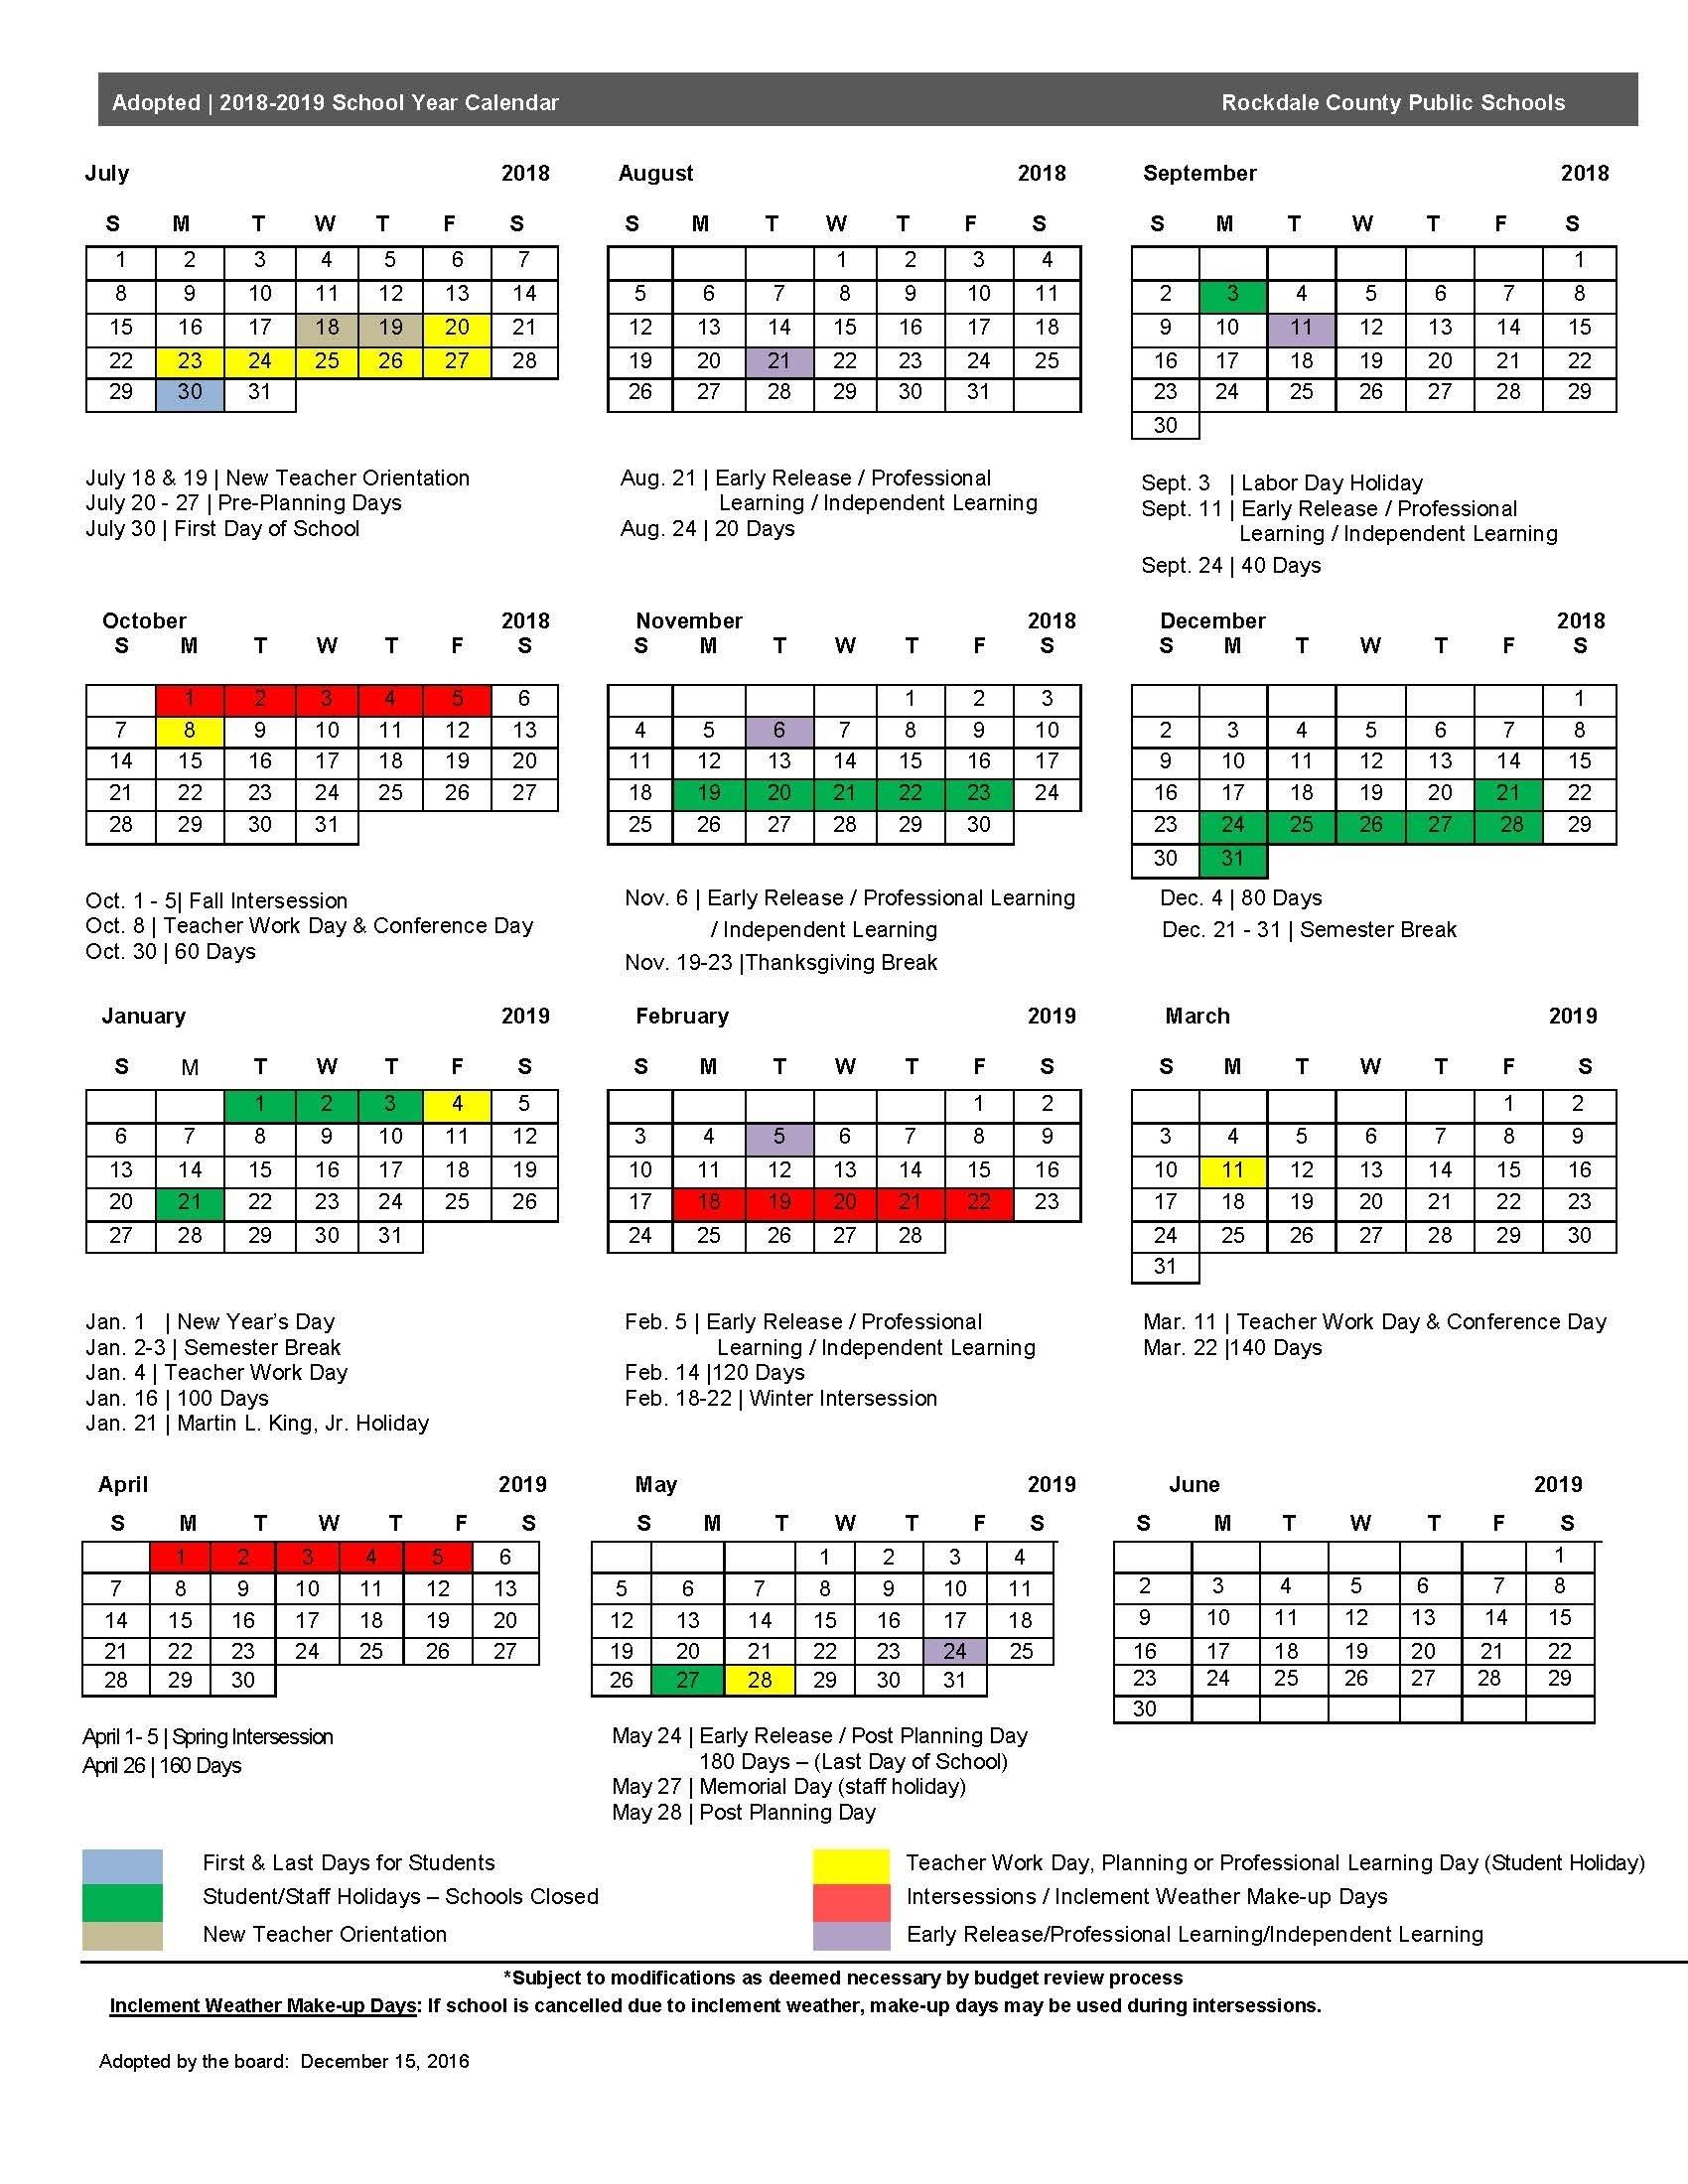 Gwinnett County School Calendar 2019 | Isacl_School Calendar Gwinnett 2020